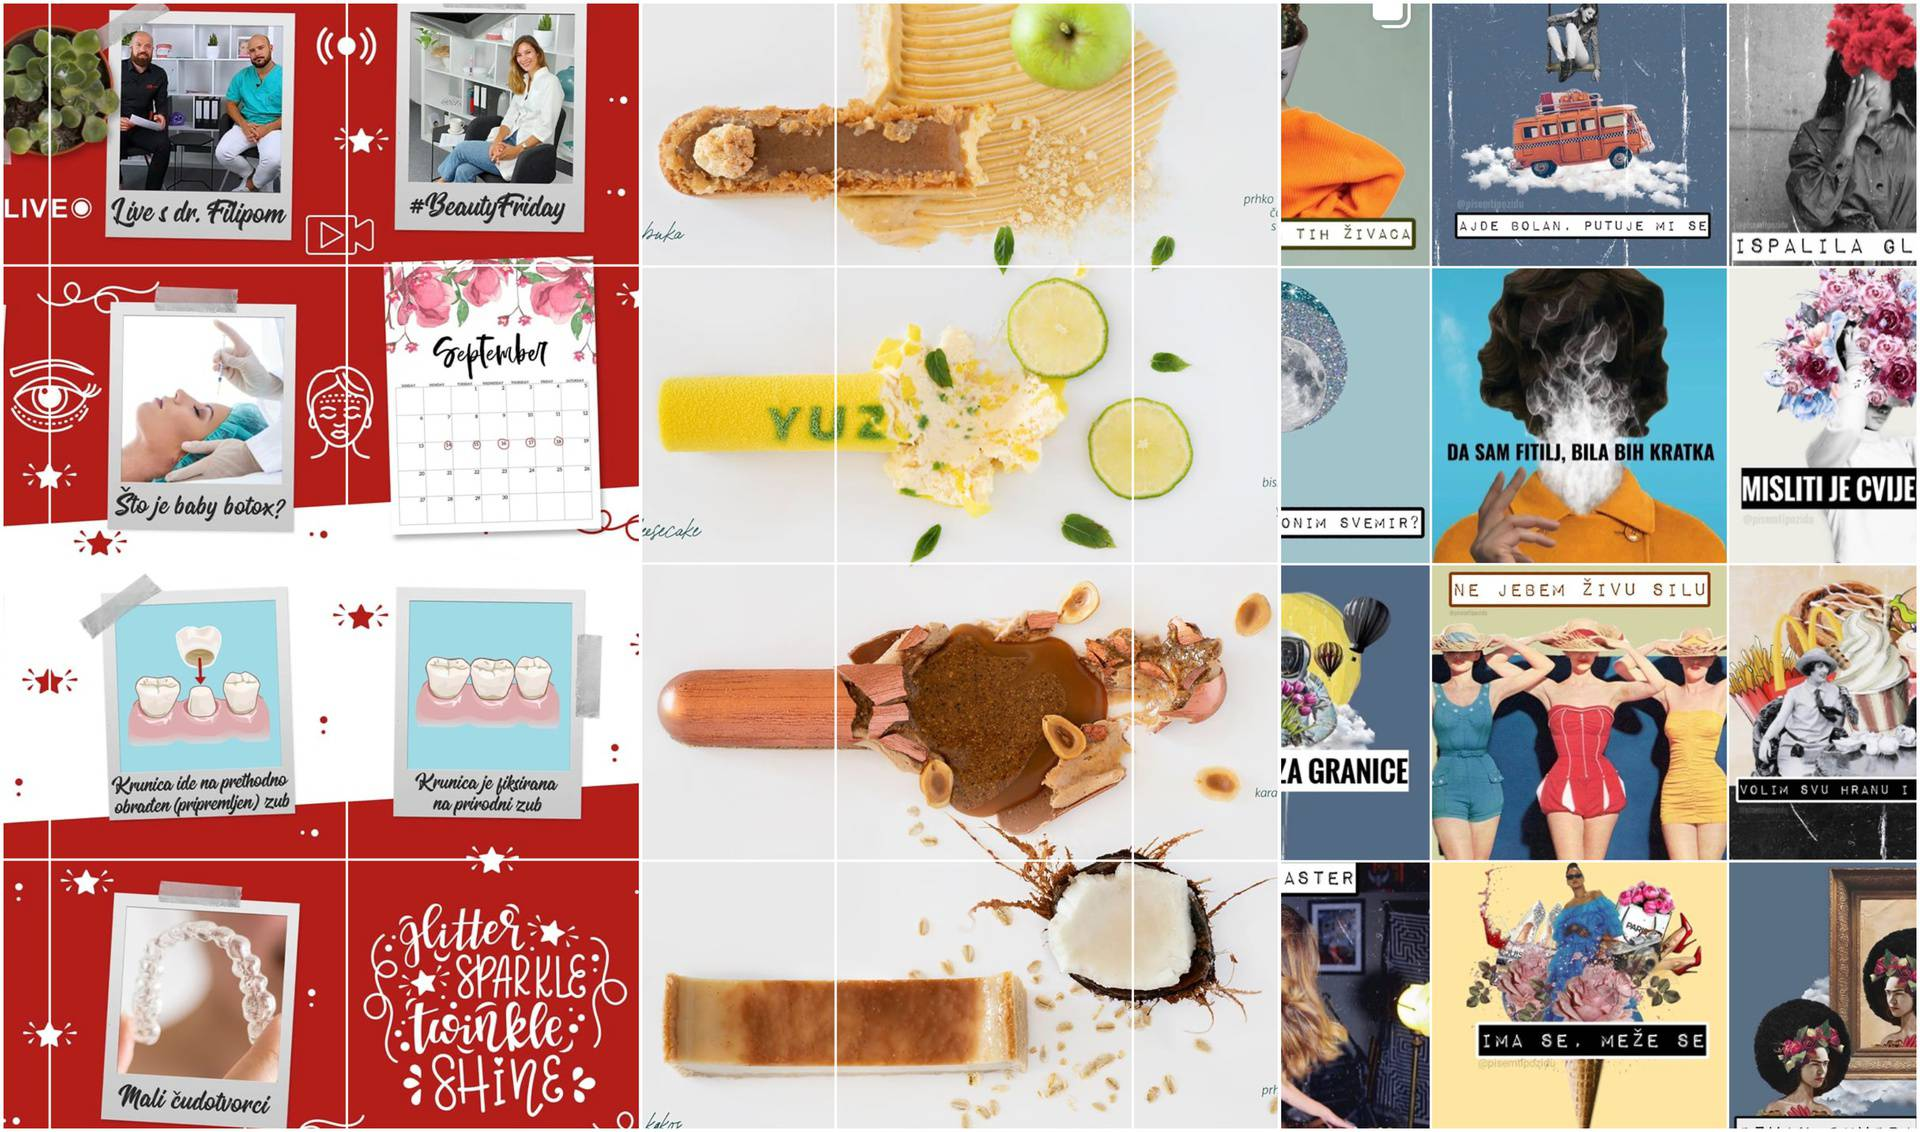 Instagram profili na koje smo se 'zakačili' jer su drugačiji